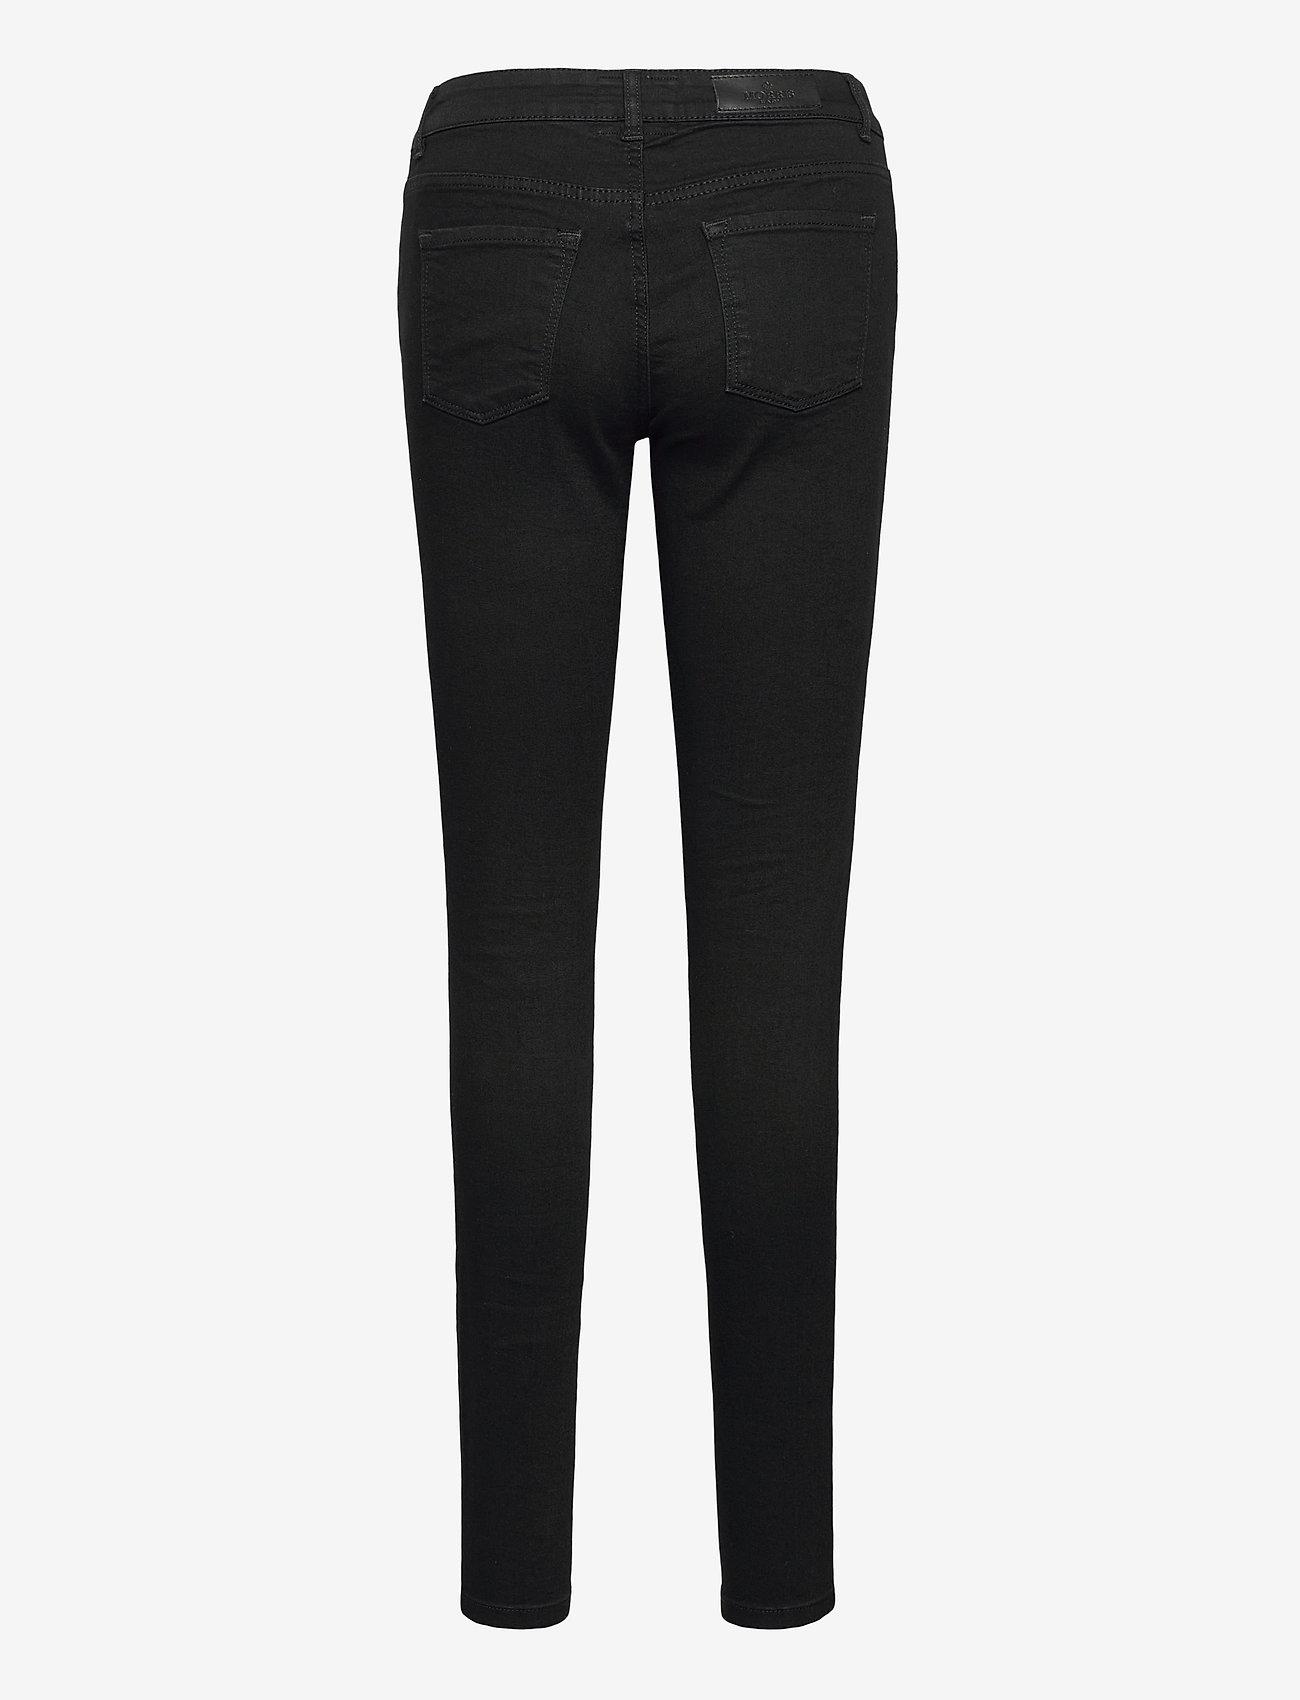 Morris Lady - Monroe Jeans - slim jeans - black - 1